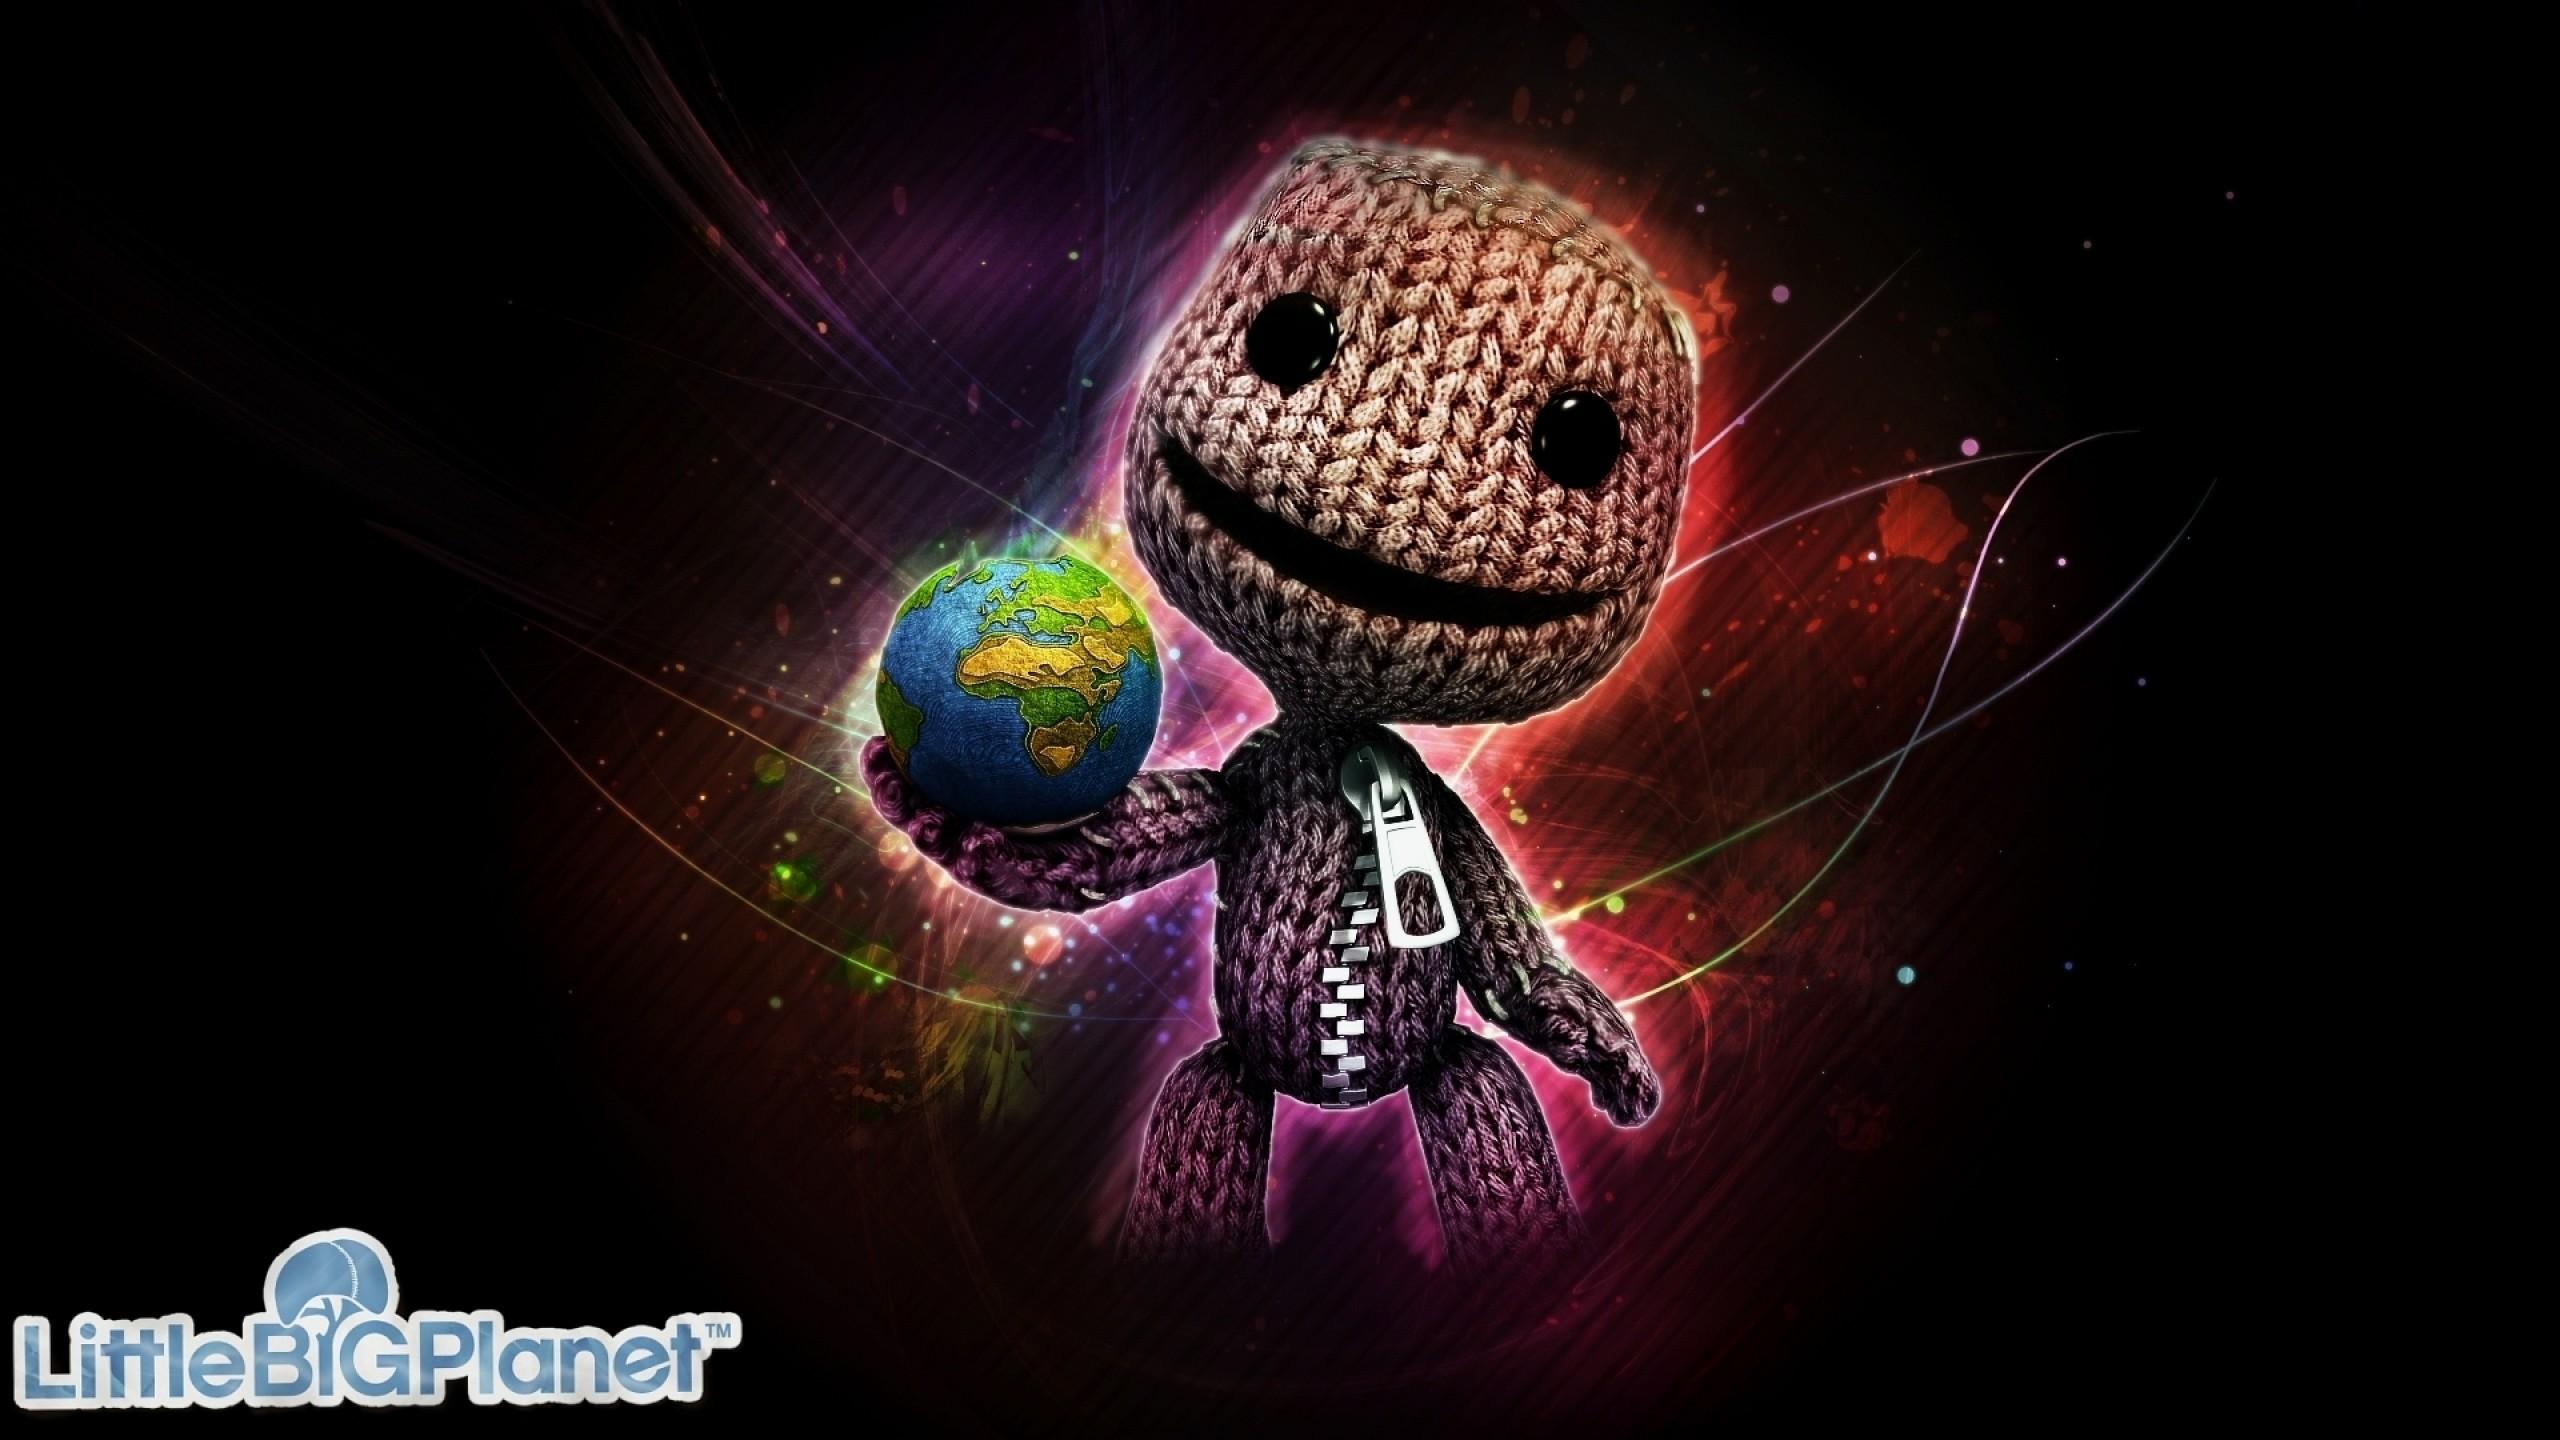 Wallpaper littlebigplanet, lbp, little big planet, sackboy, doll